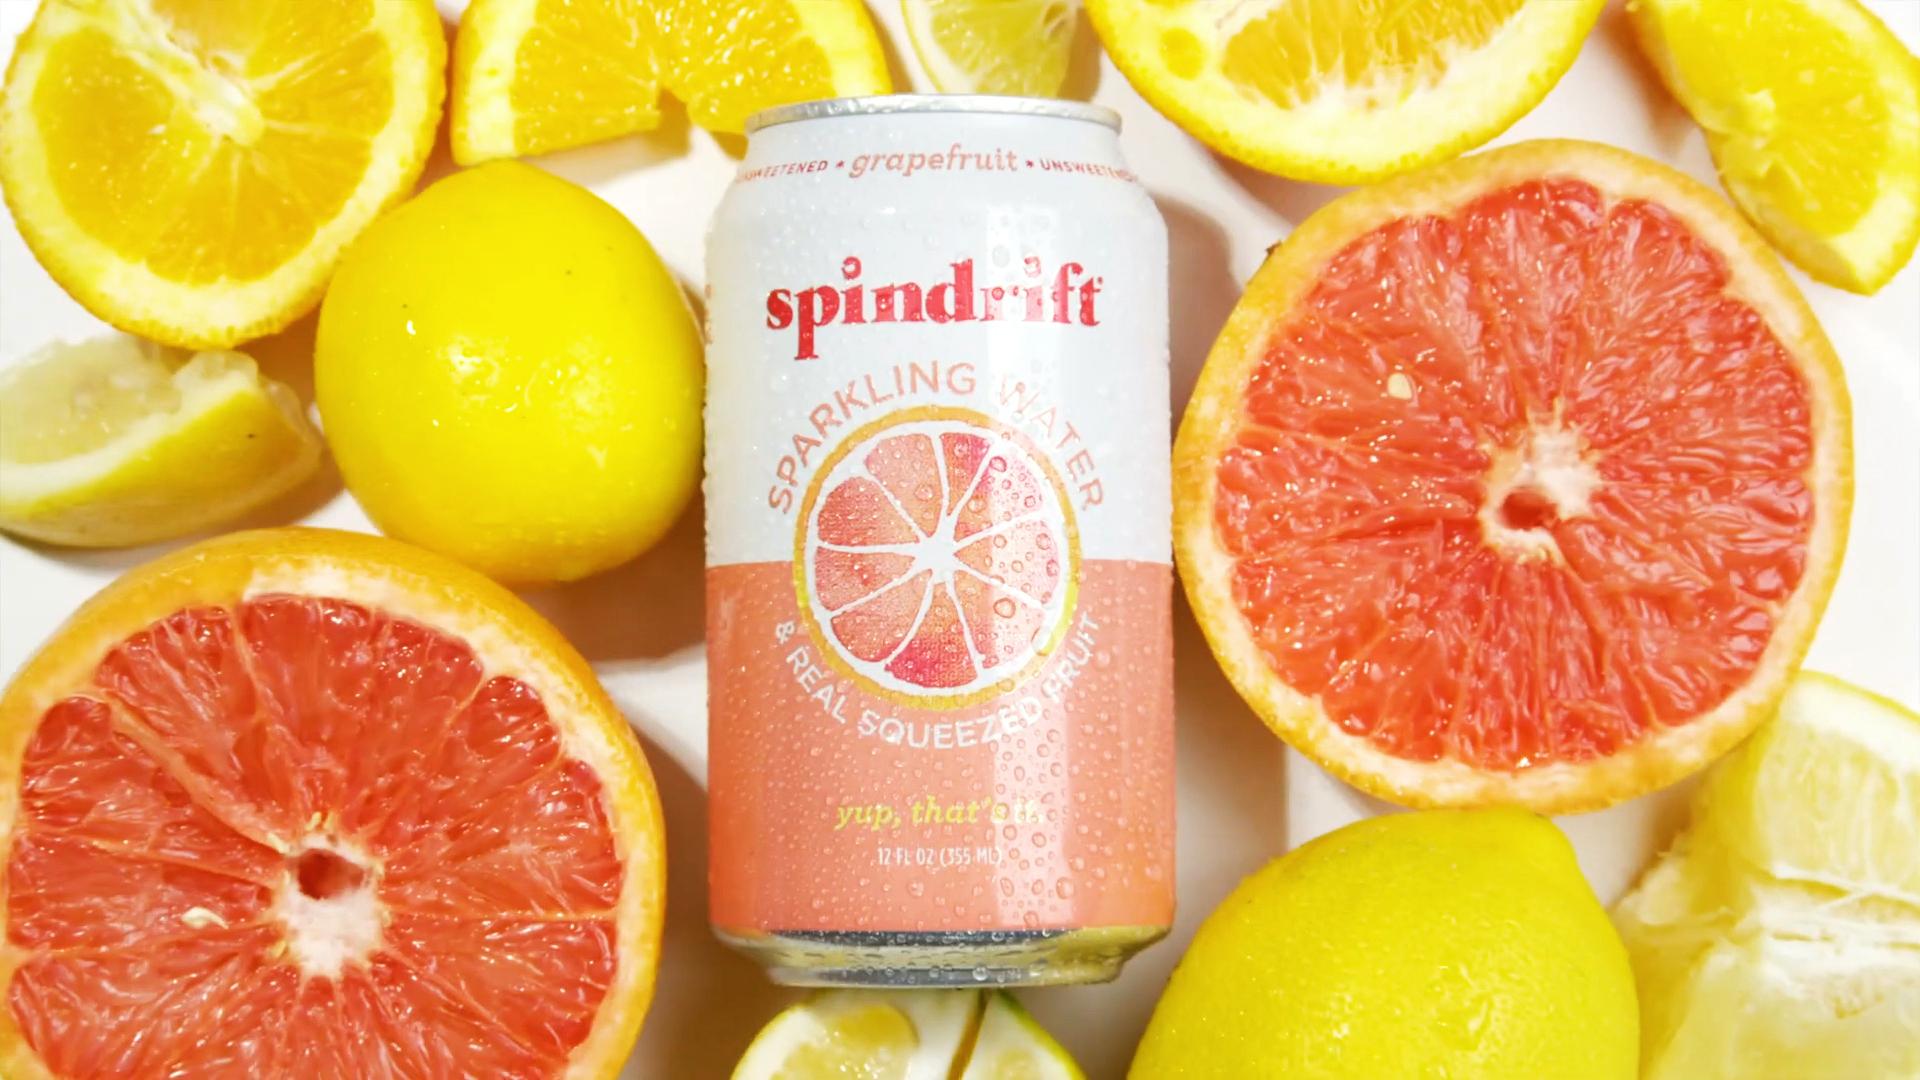 Spindrift Grapefruit Sparkling Water Spec